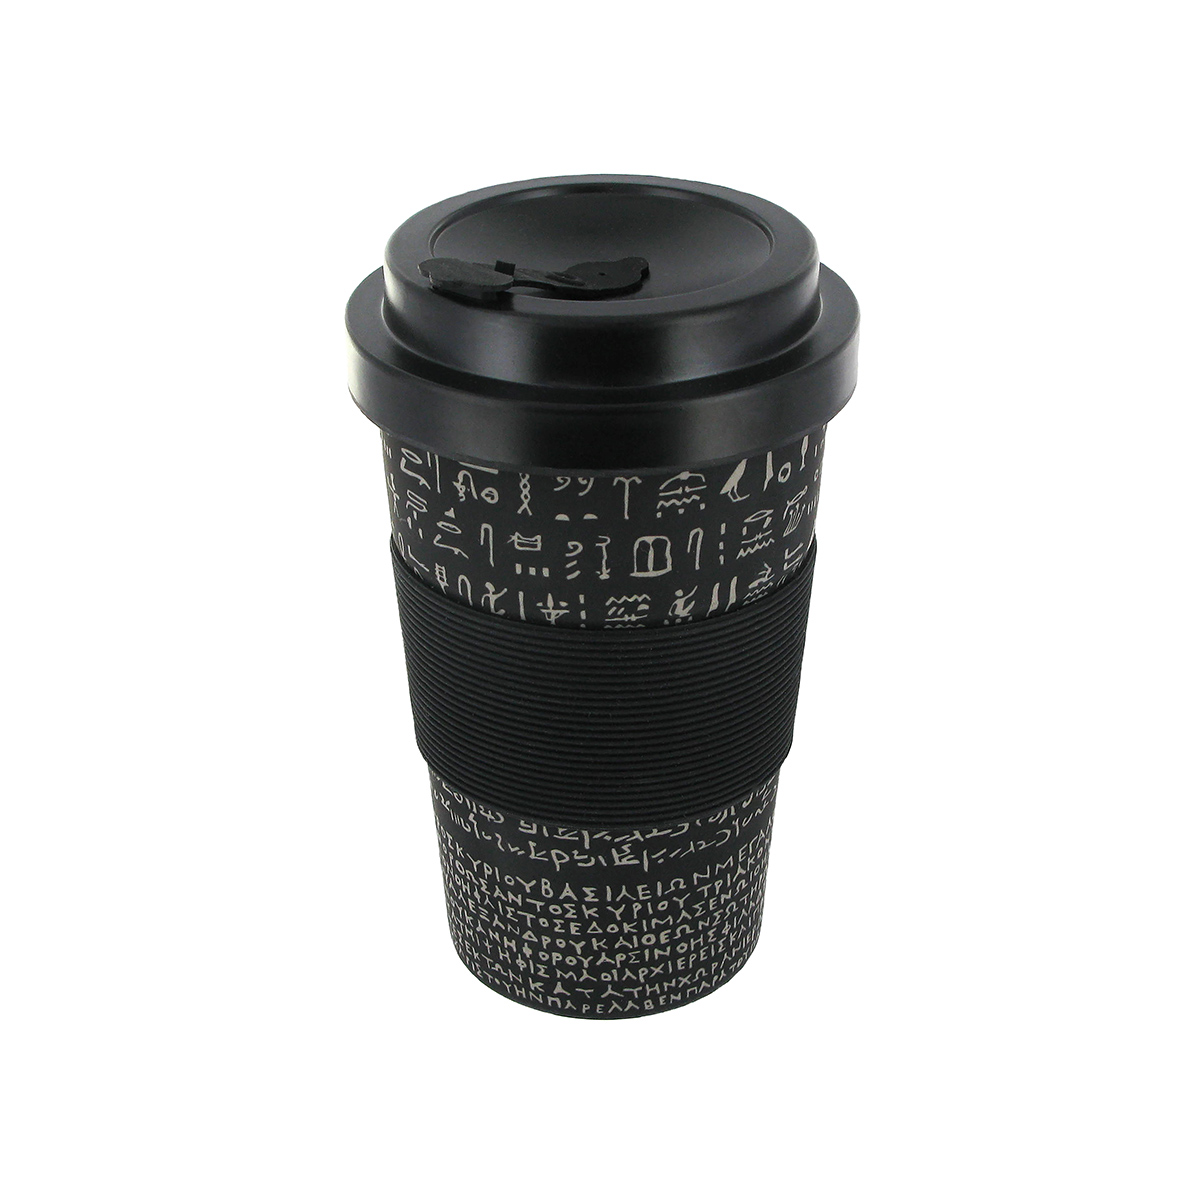 Rosetta Stone travel cup